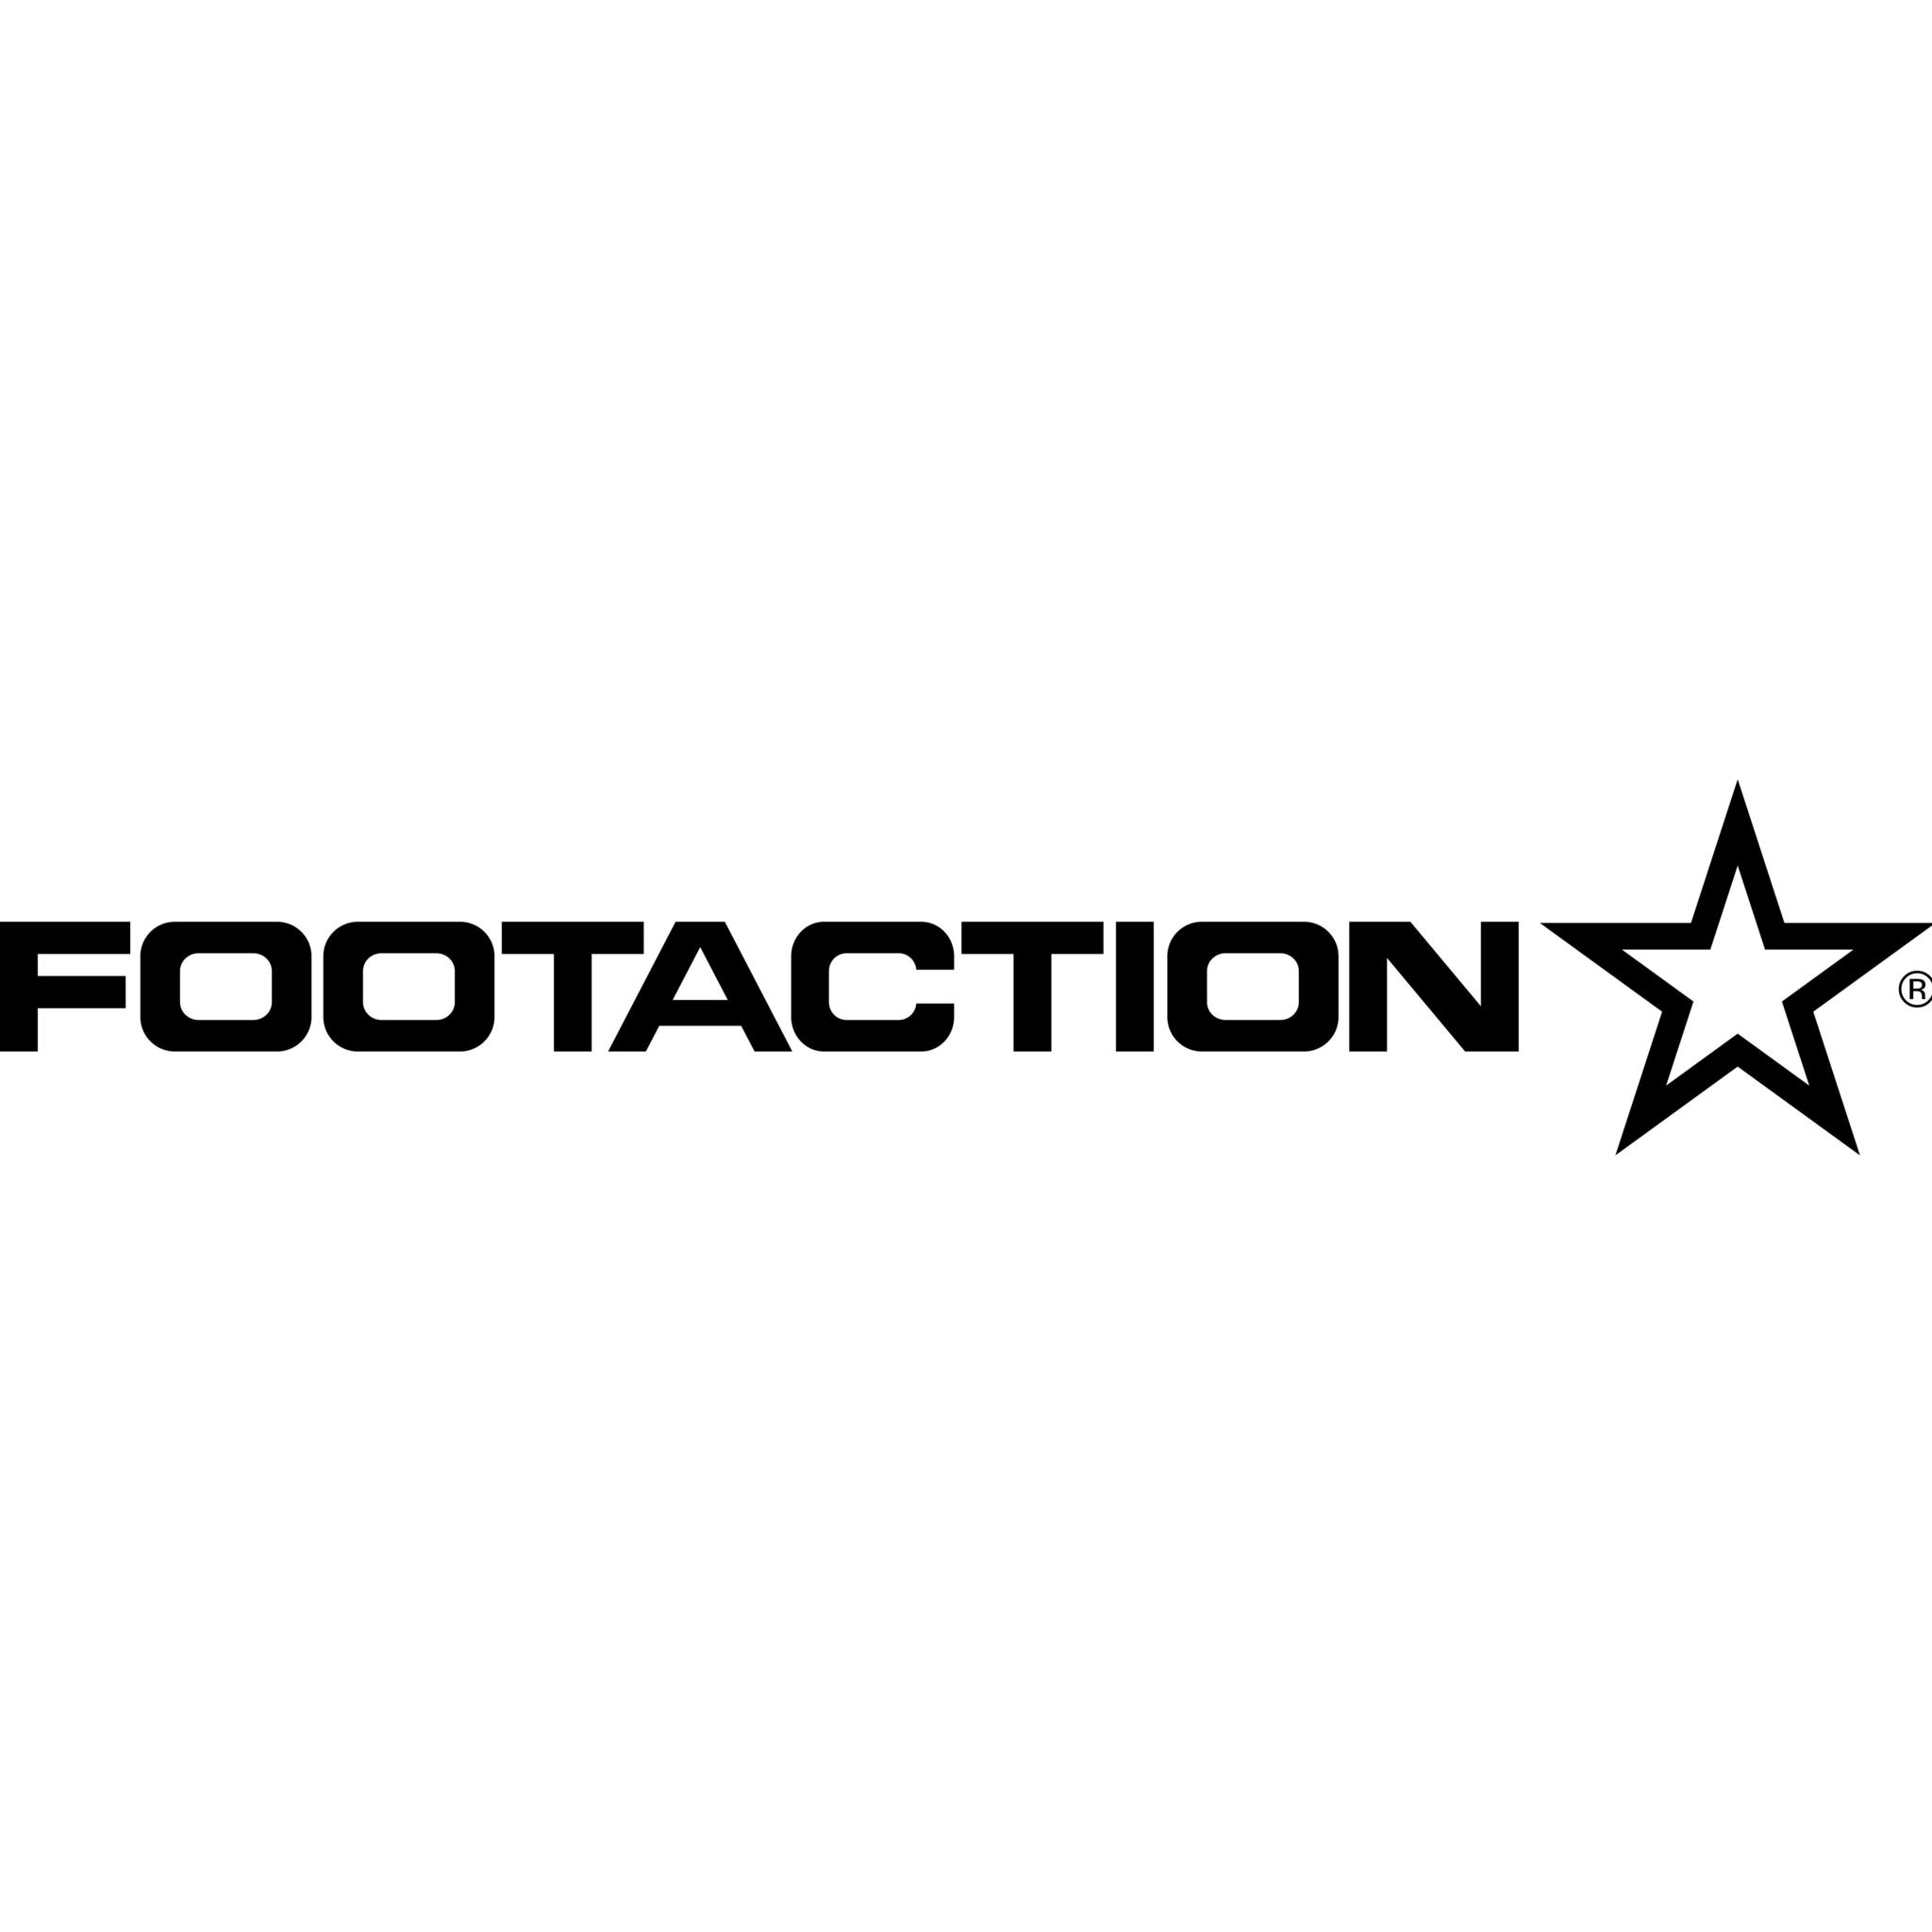 Footaction - Sportswear Stores